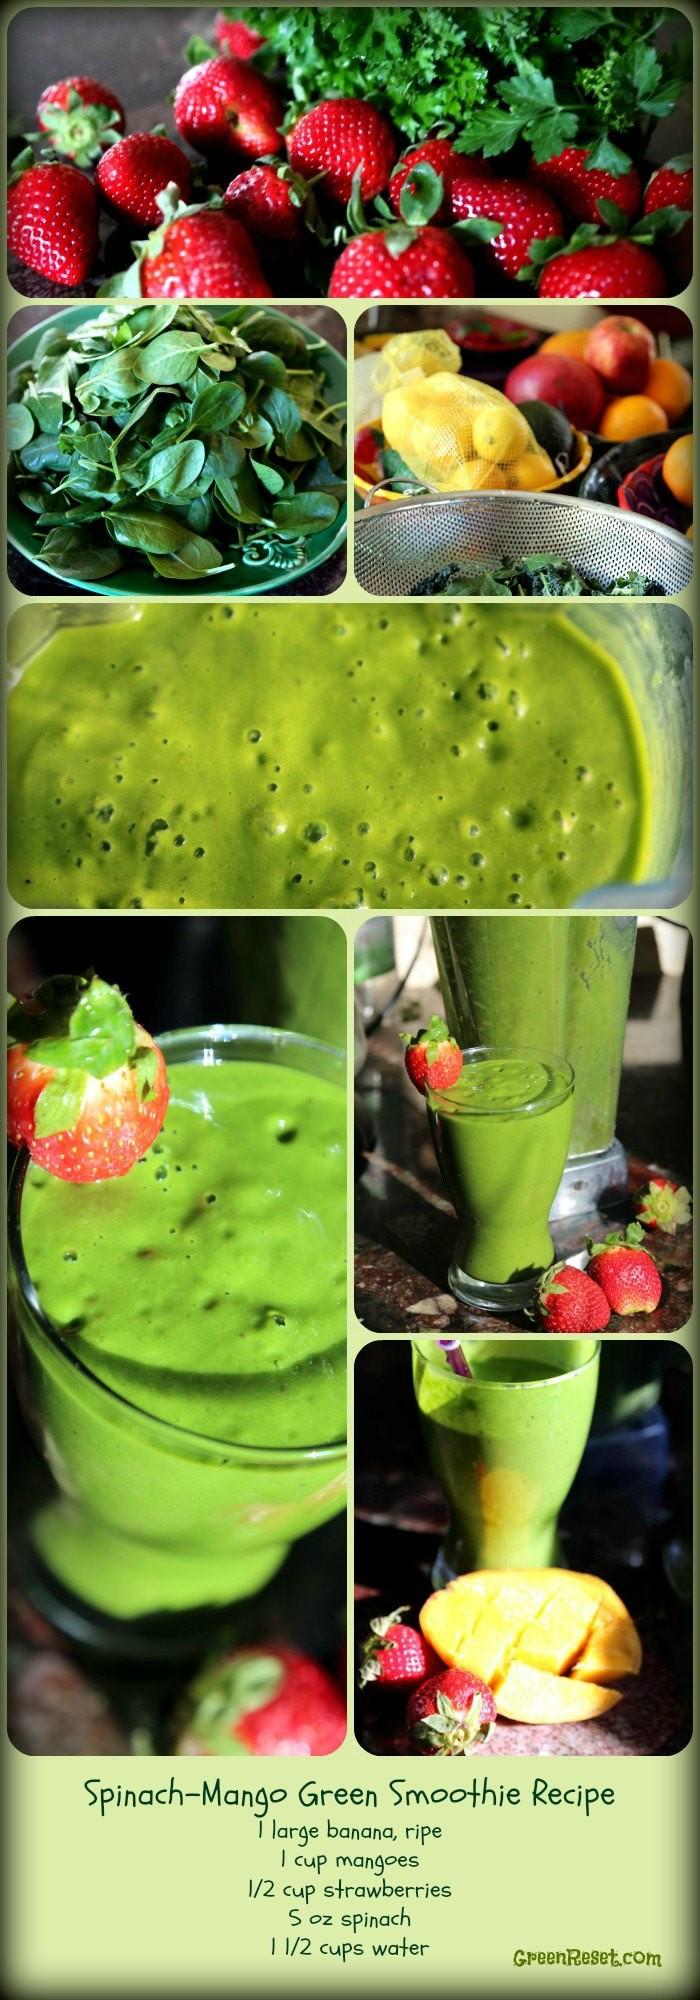 Healthy Breakfast Smoothies Recipes  9 Breakfast Smoothies Plus 3 More Super Healthy Breakfast